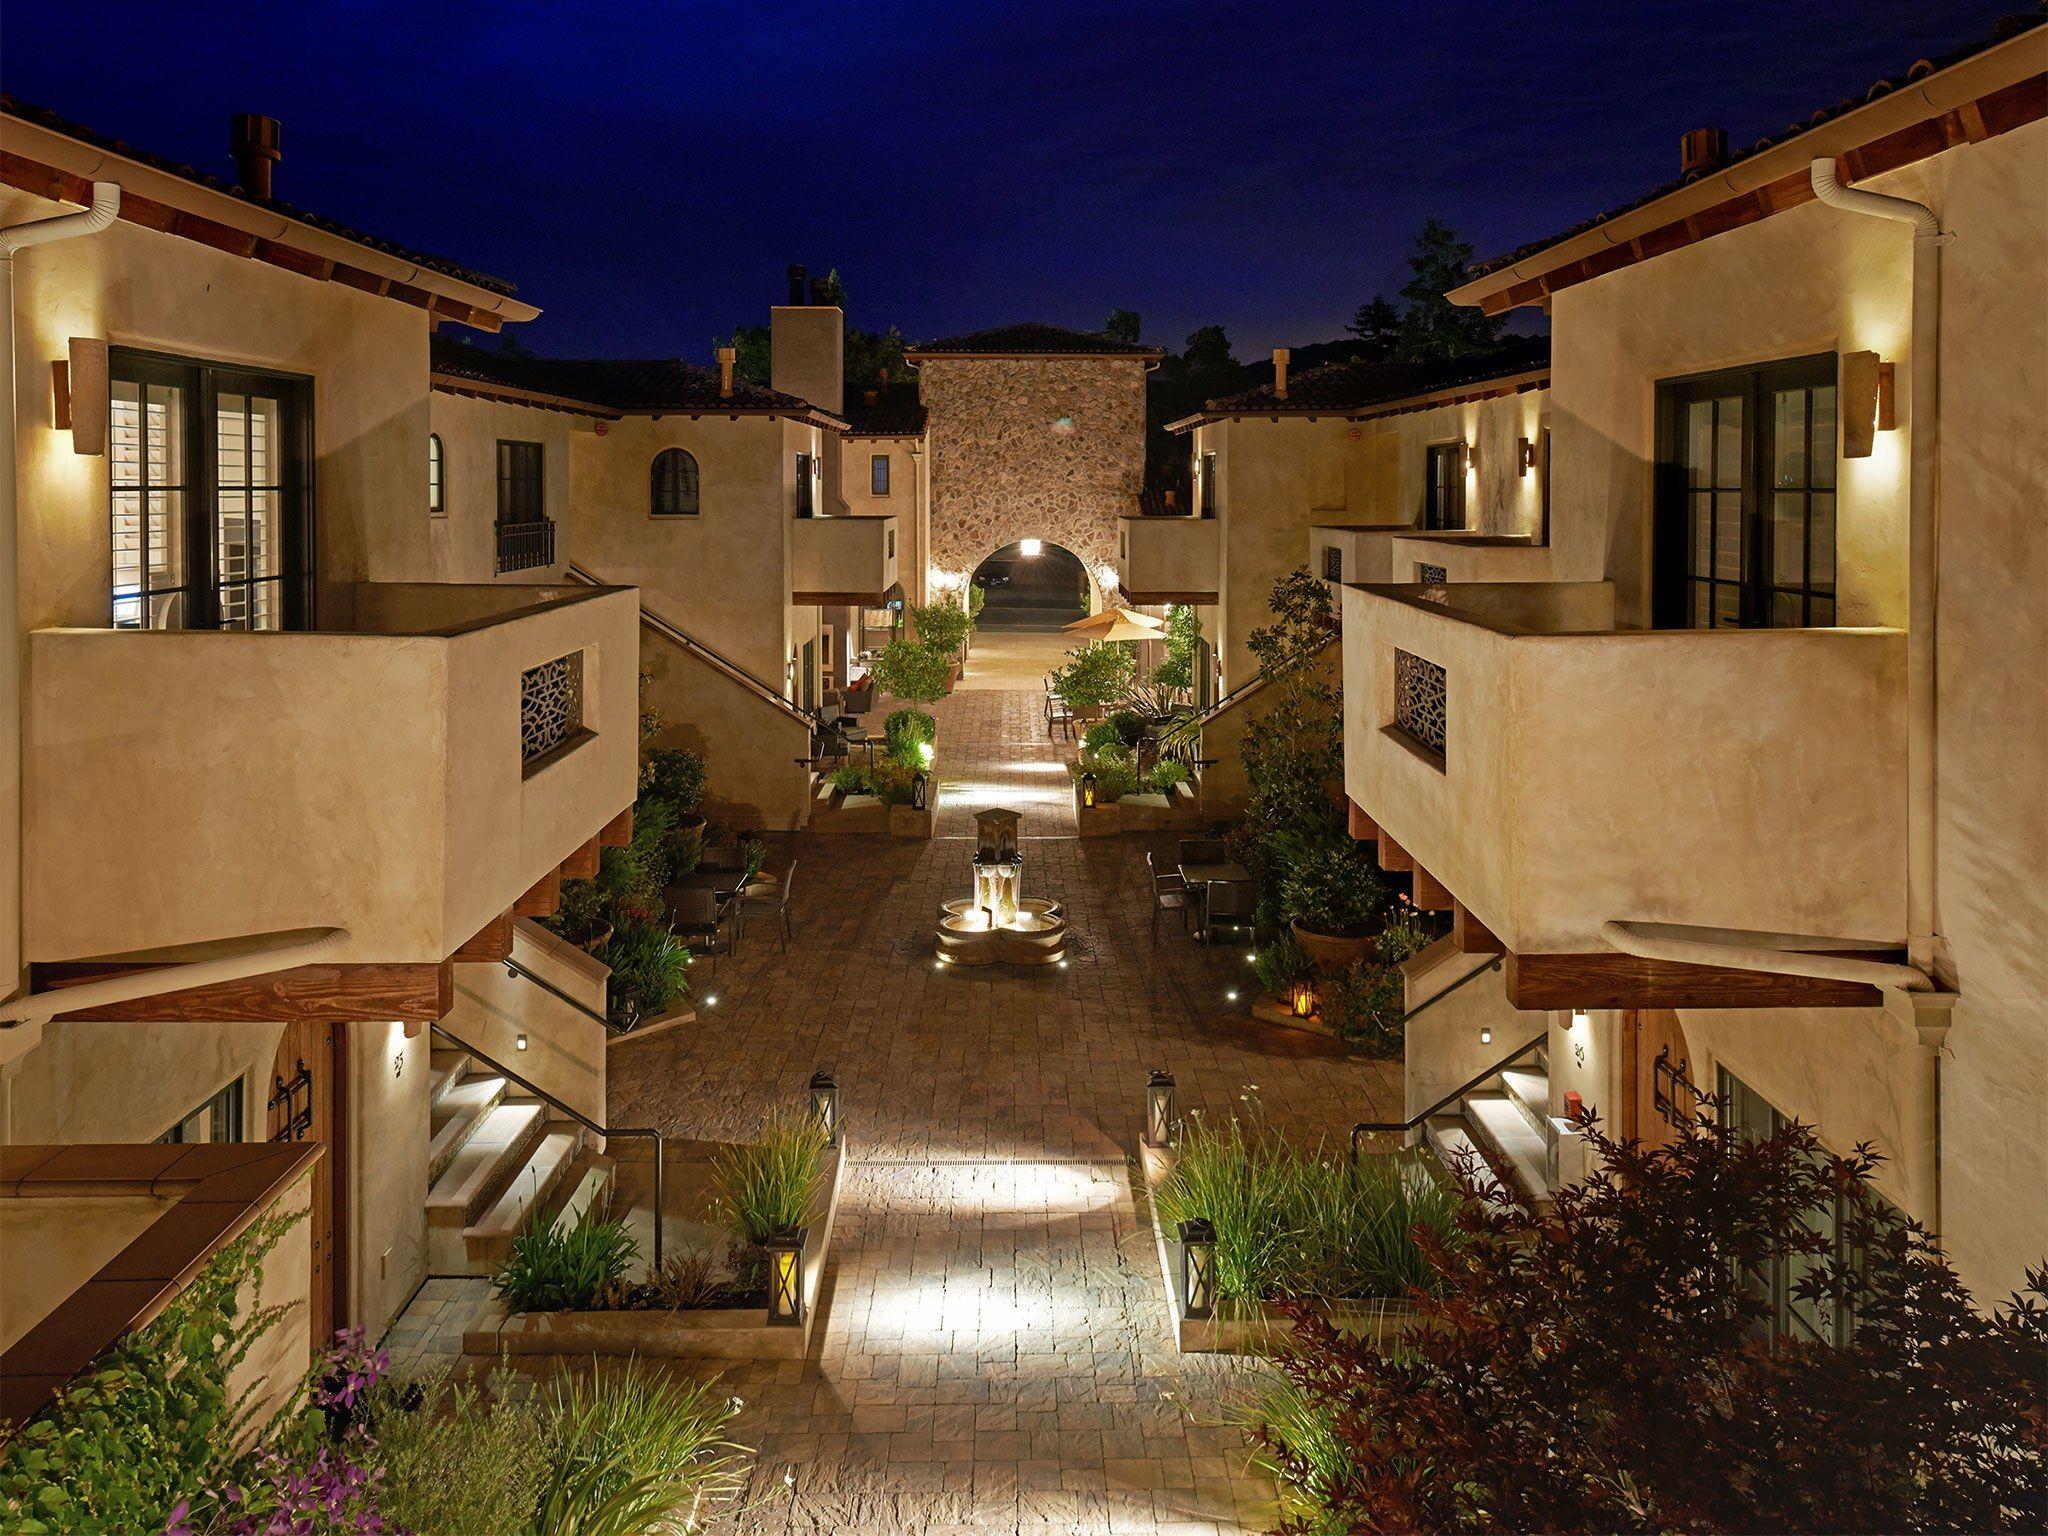 North Block Hotel Yountville California United States Hotel